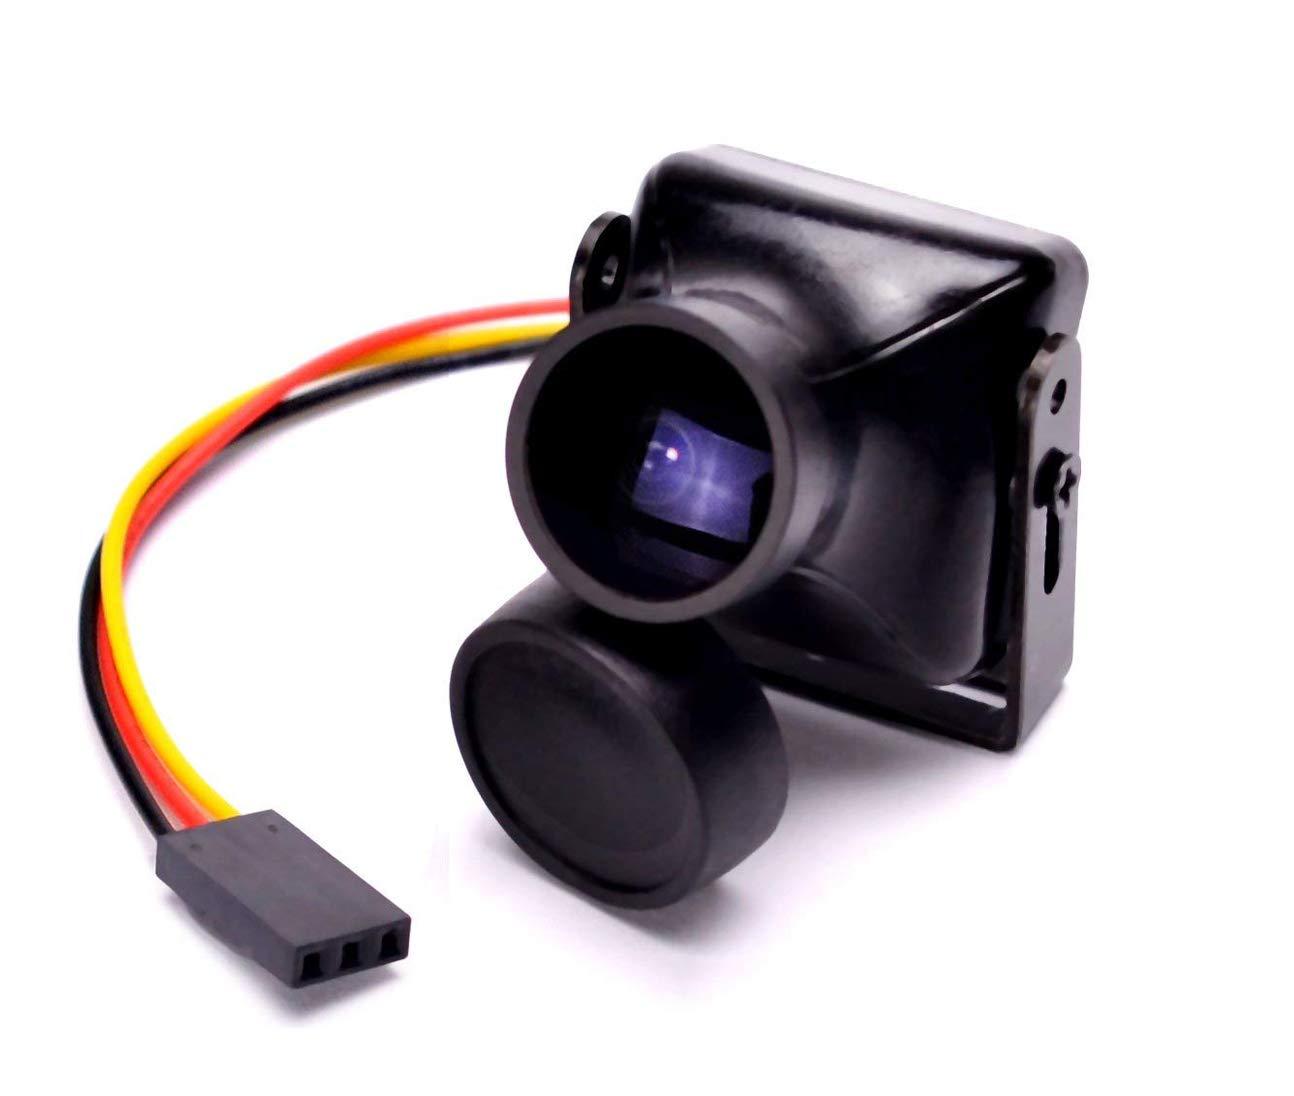 HD 1200TVL FPV Camera CMOS NTSC 2.8mm Lens Mini CCTV Security Video Camera for FPV Quadcopter ZMR250